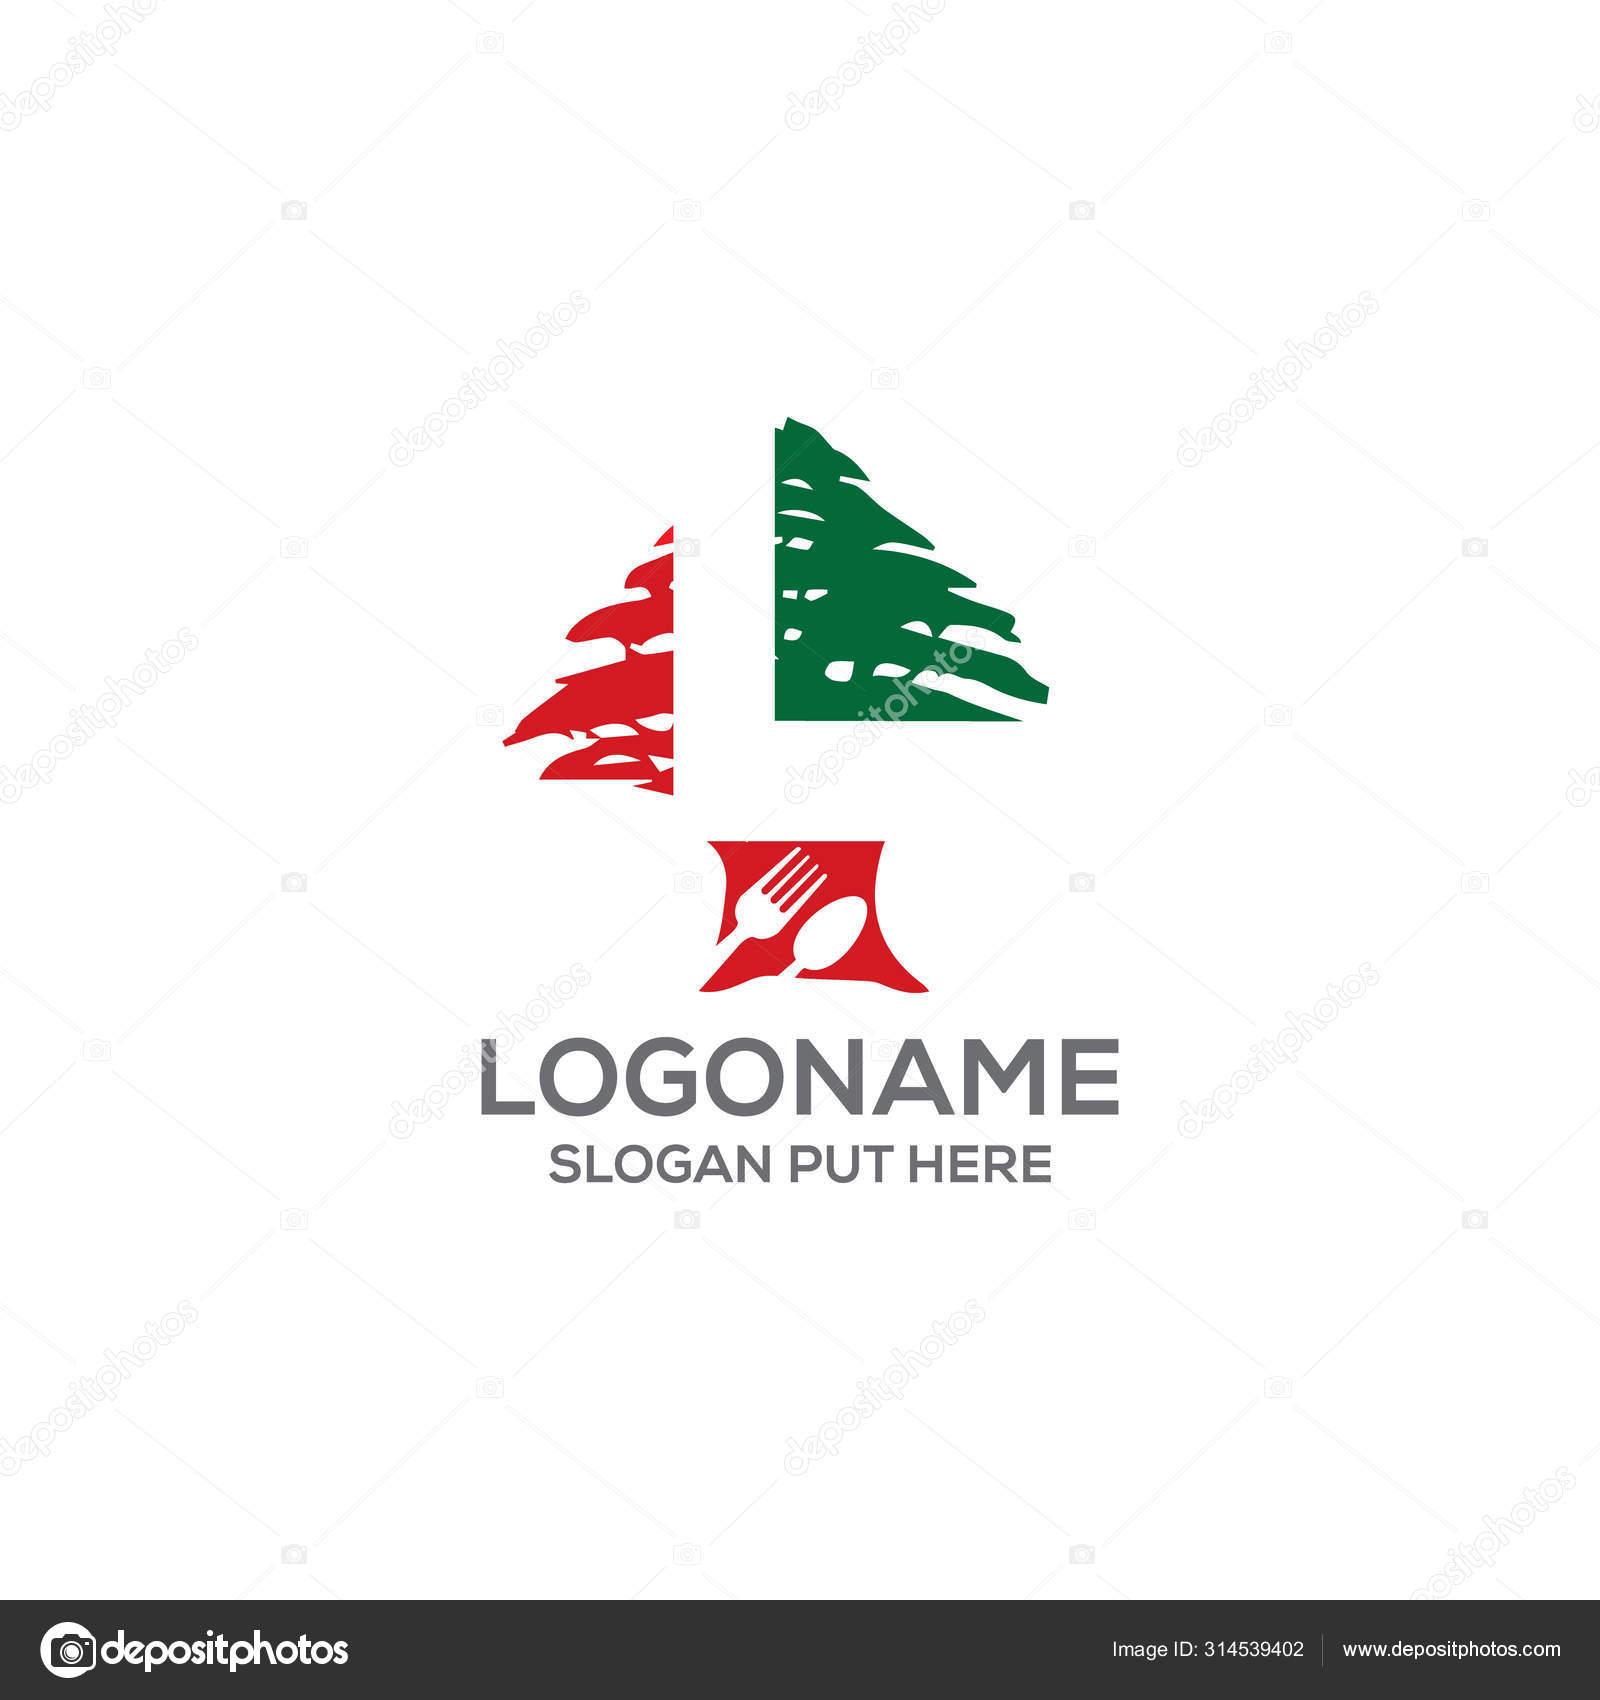 Creative Modern Lebanese Food Logo Design Template Restaurant Company Business Stock Vector C Sahelahmedbd83 314539402